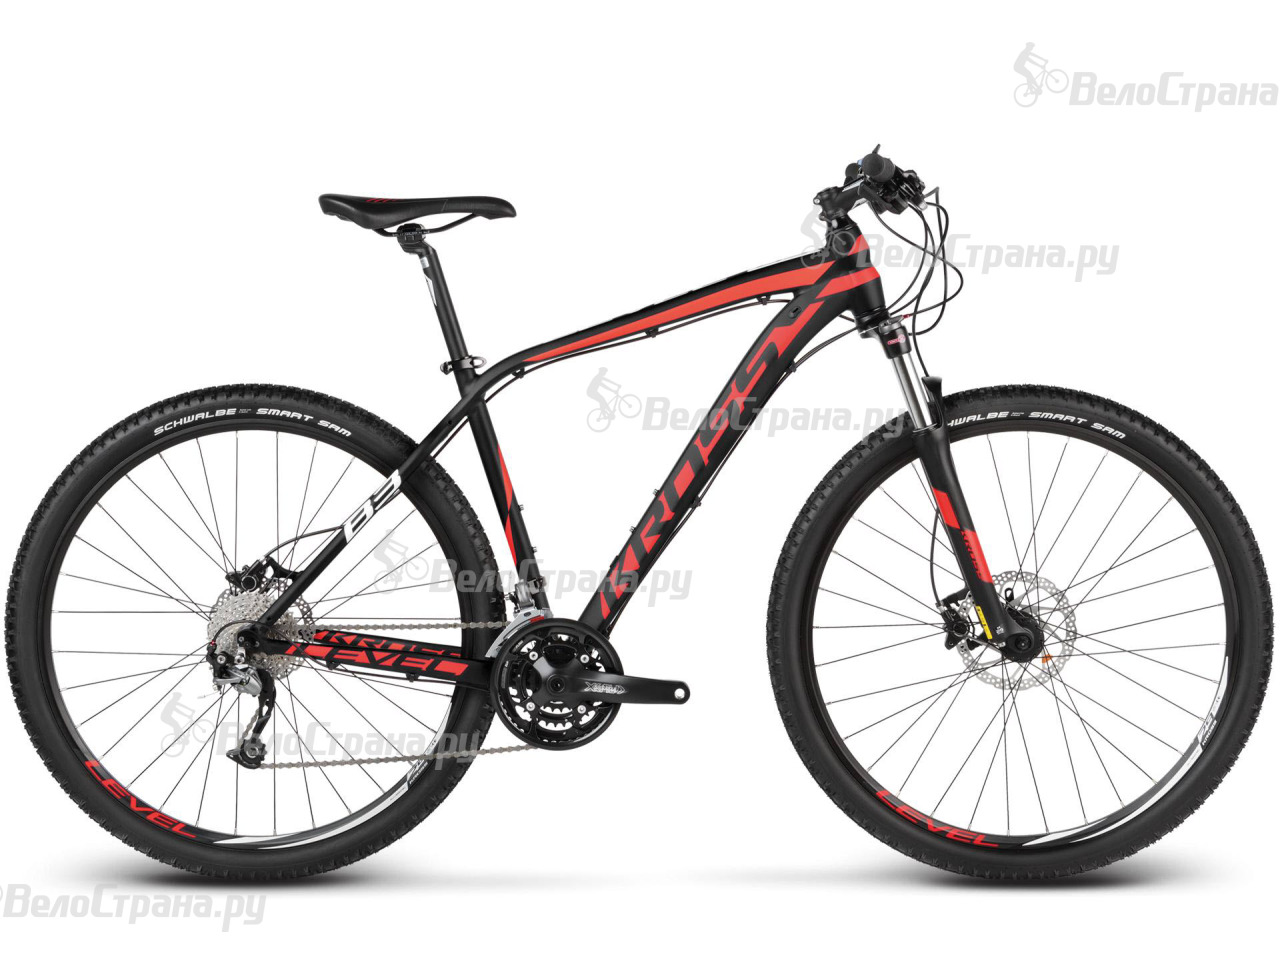 Велосипед Kross Level B3 (2017) все цены